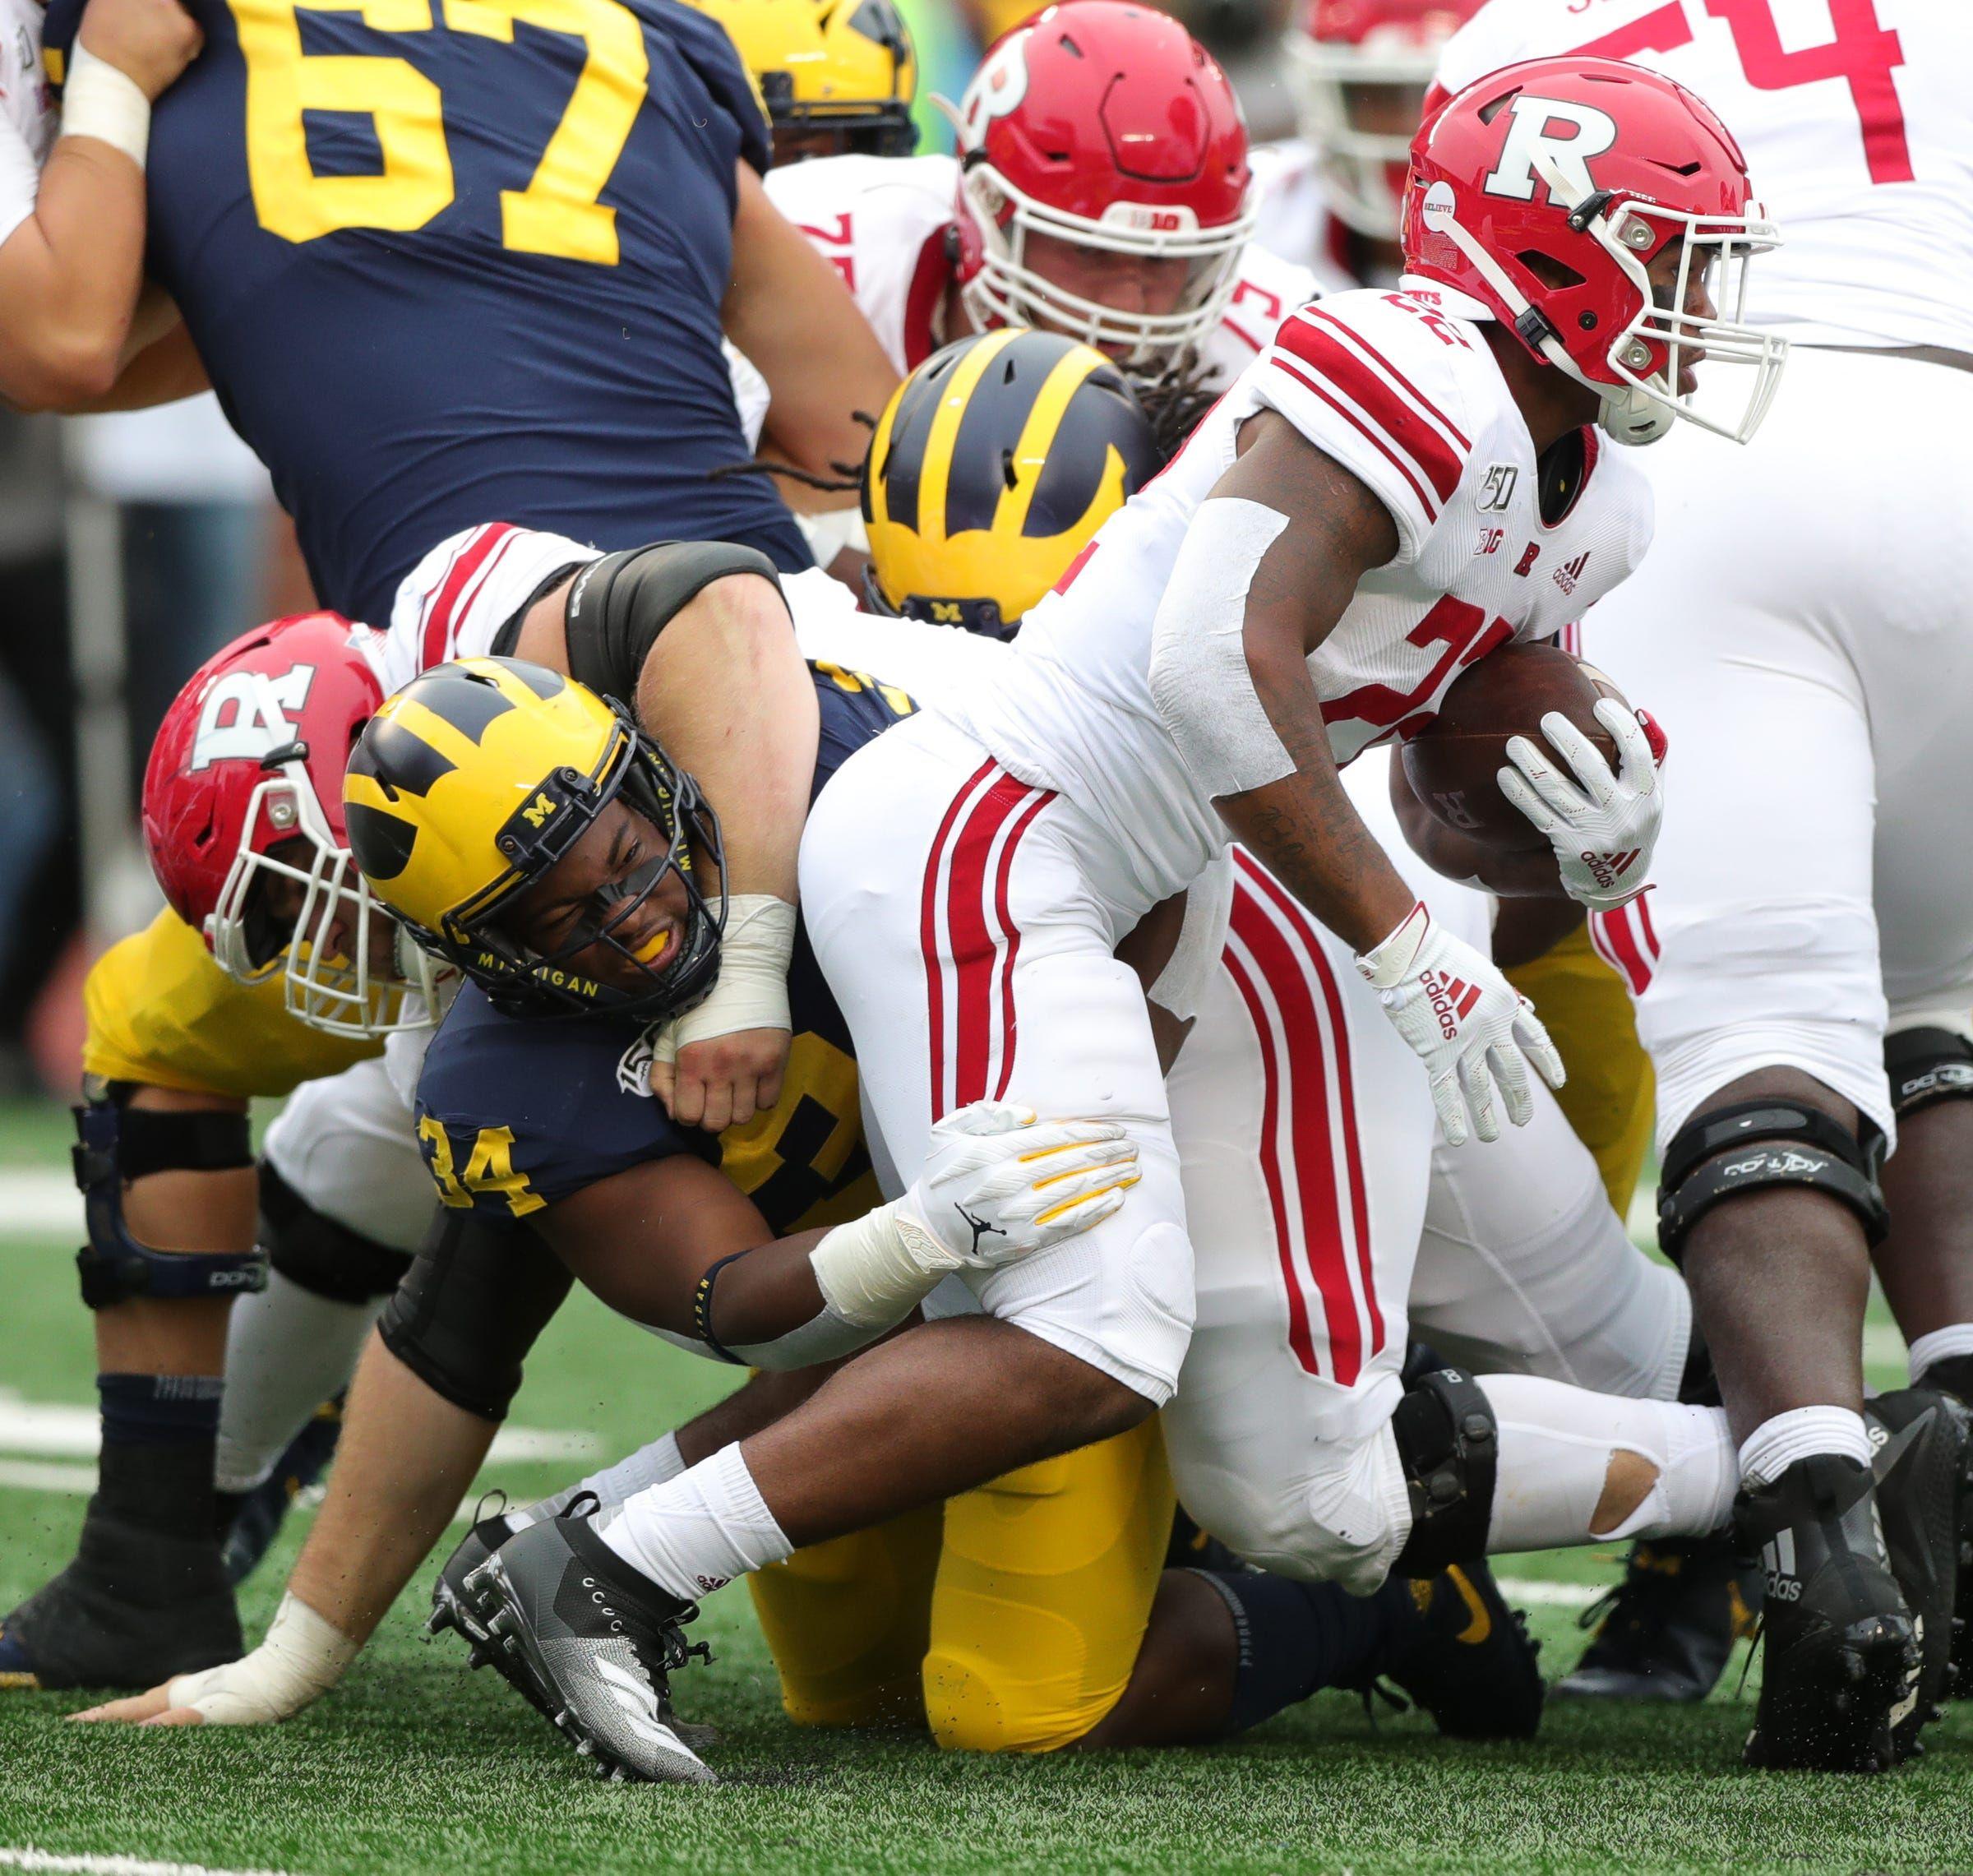 Michigan football linebacker Jordan Anthony enters NCAA